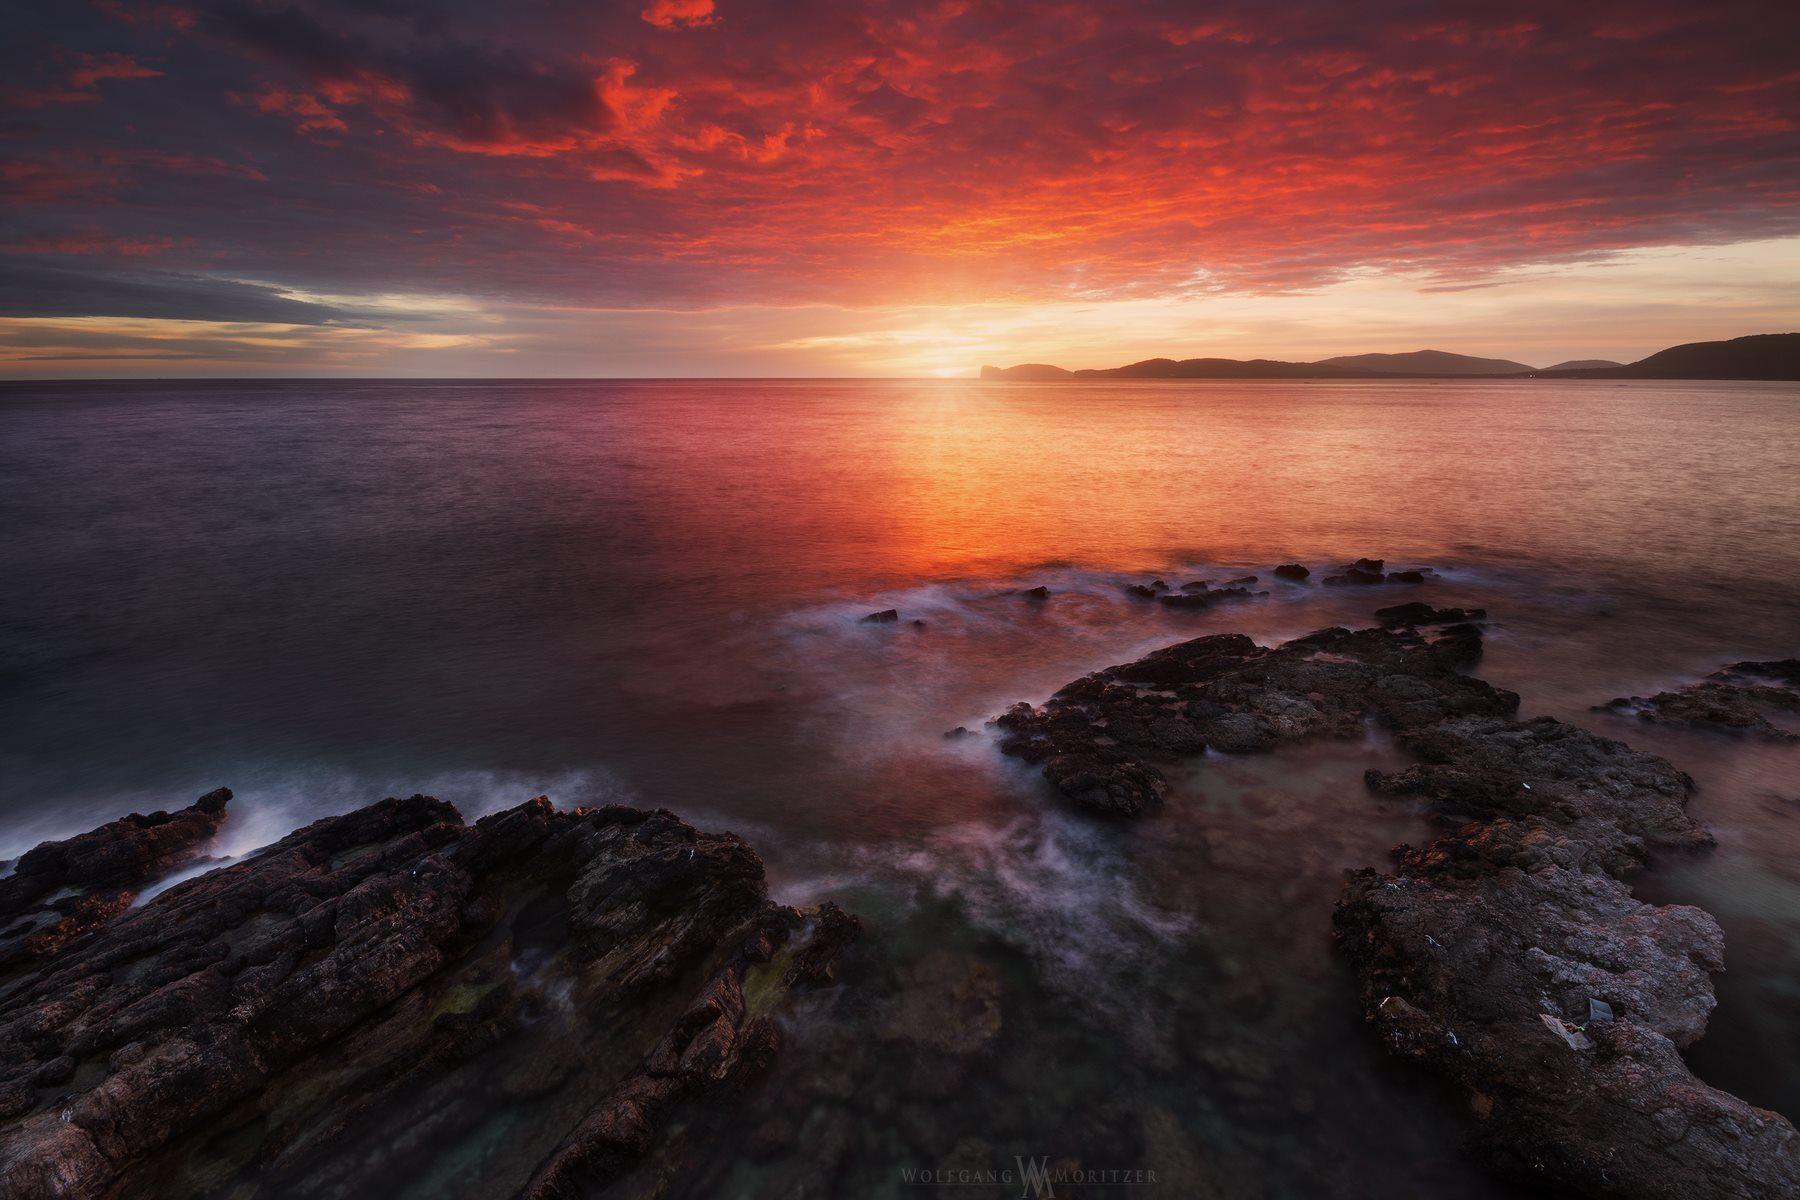 Alghero Sunset, Italy